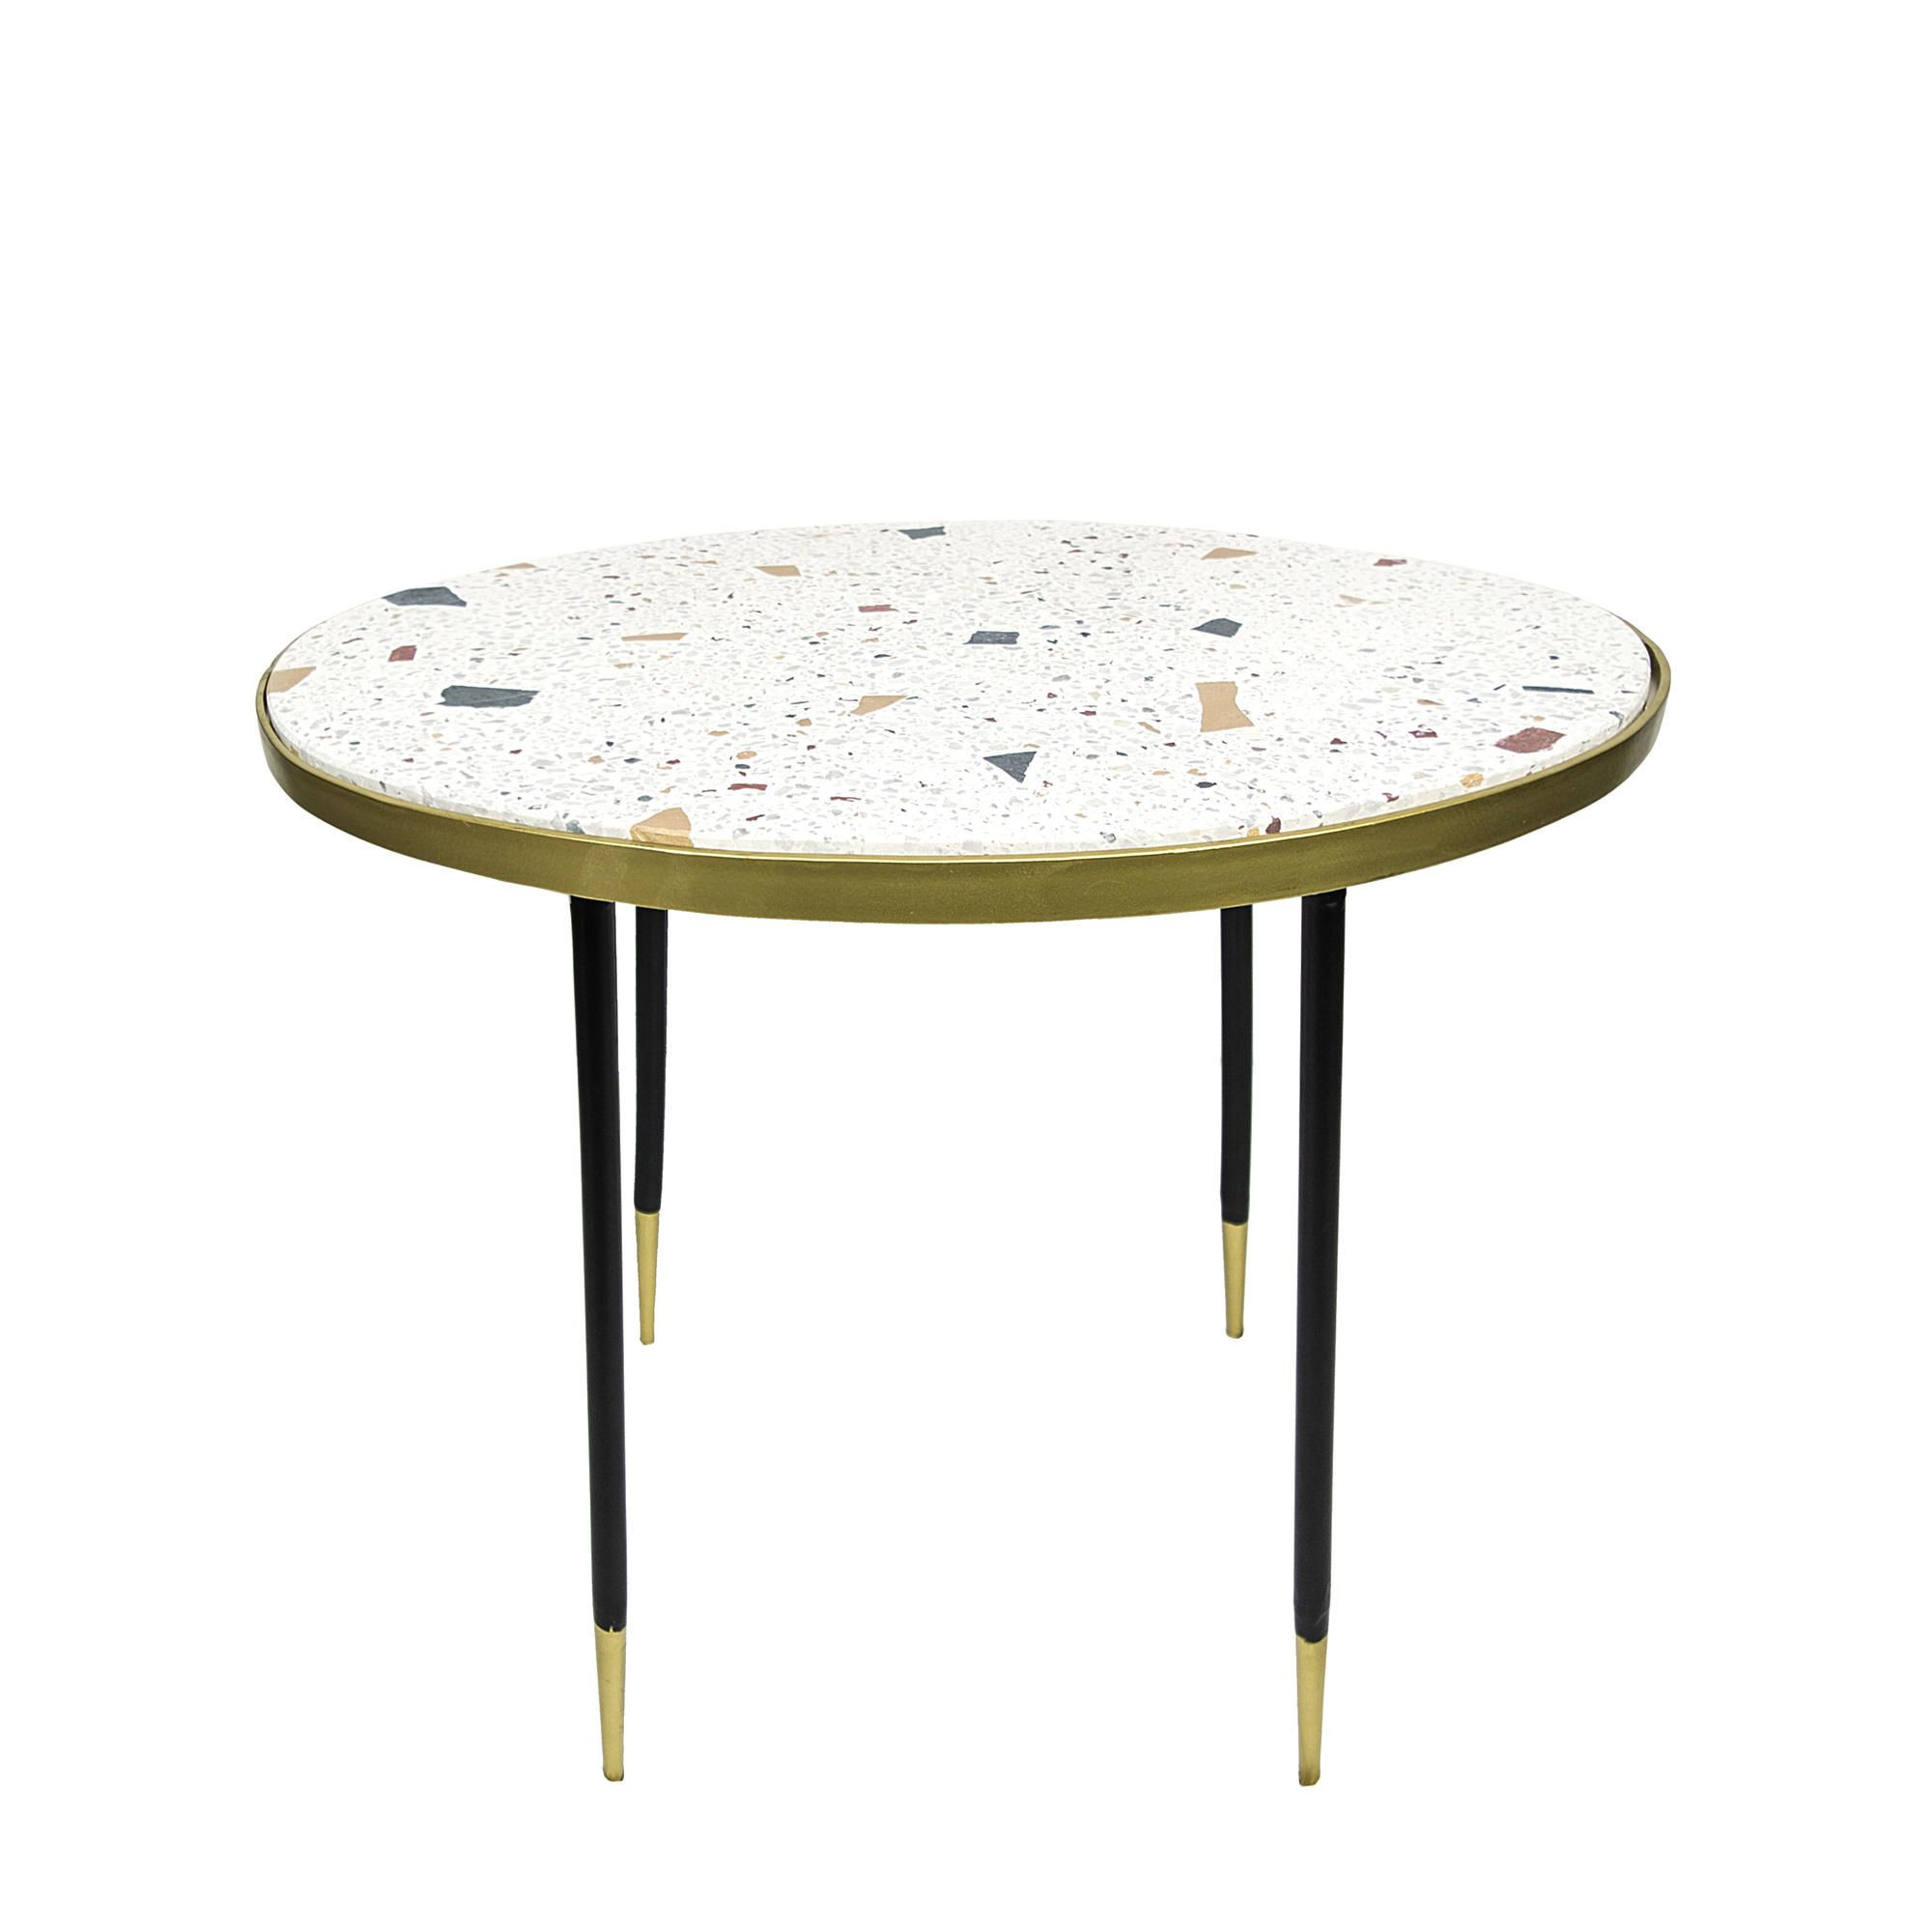 Genuine Side Table H 49 cm | Beige